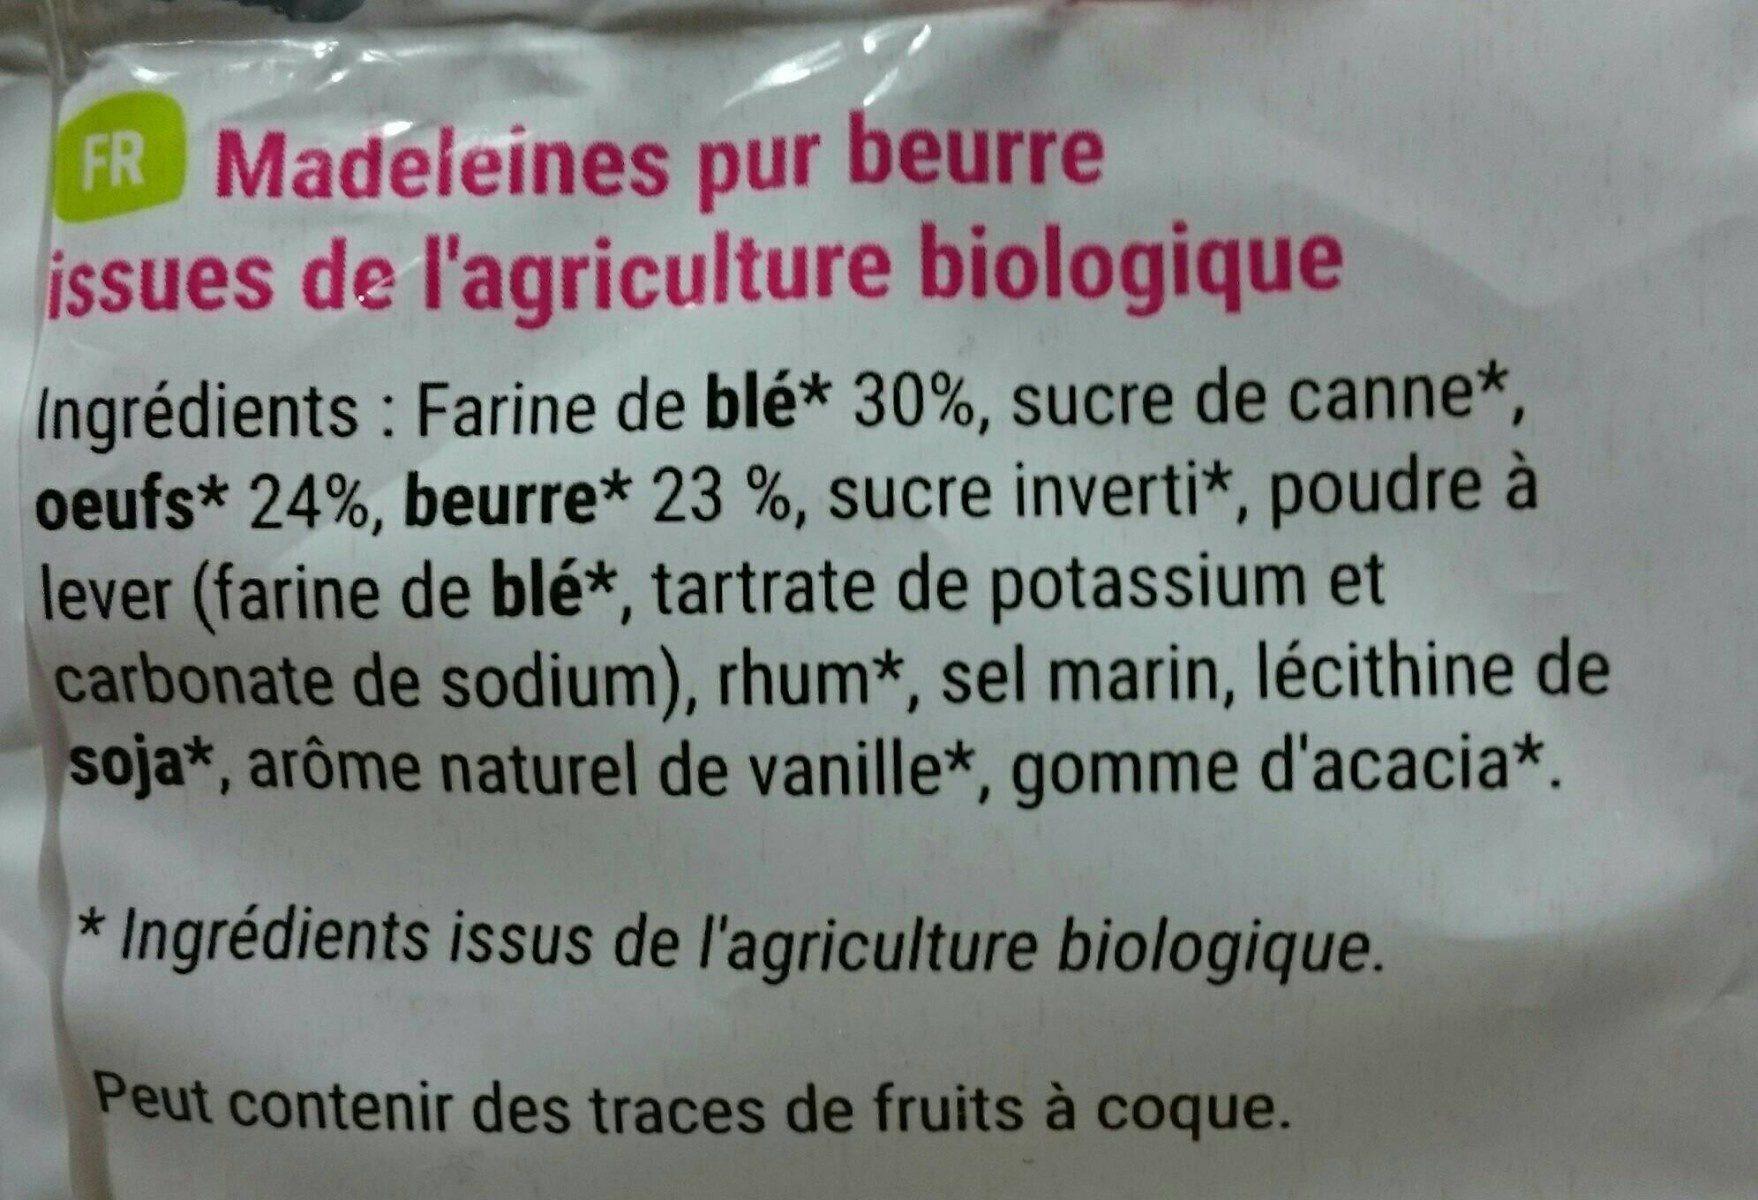 madeleines longues pur beurre - Ingrediënten